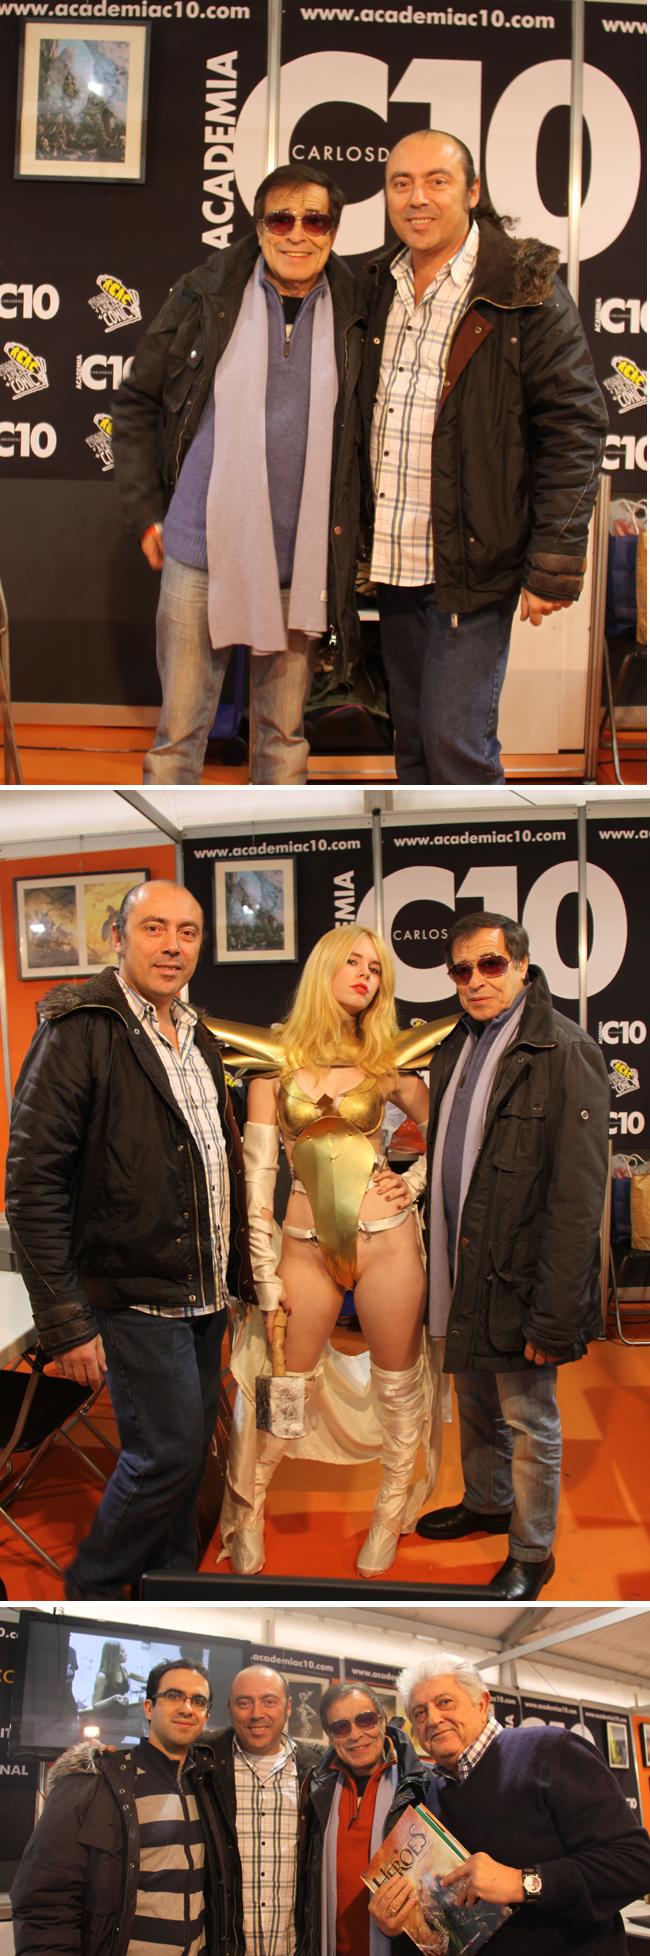 Alfonso-Azpiri-visita-stand-Academiac10-Expocomic-Madrid